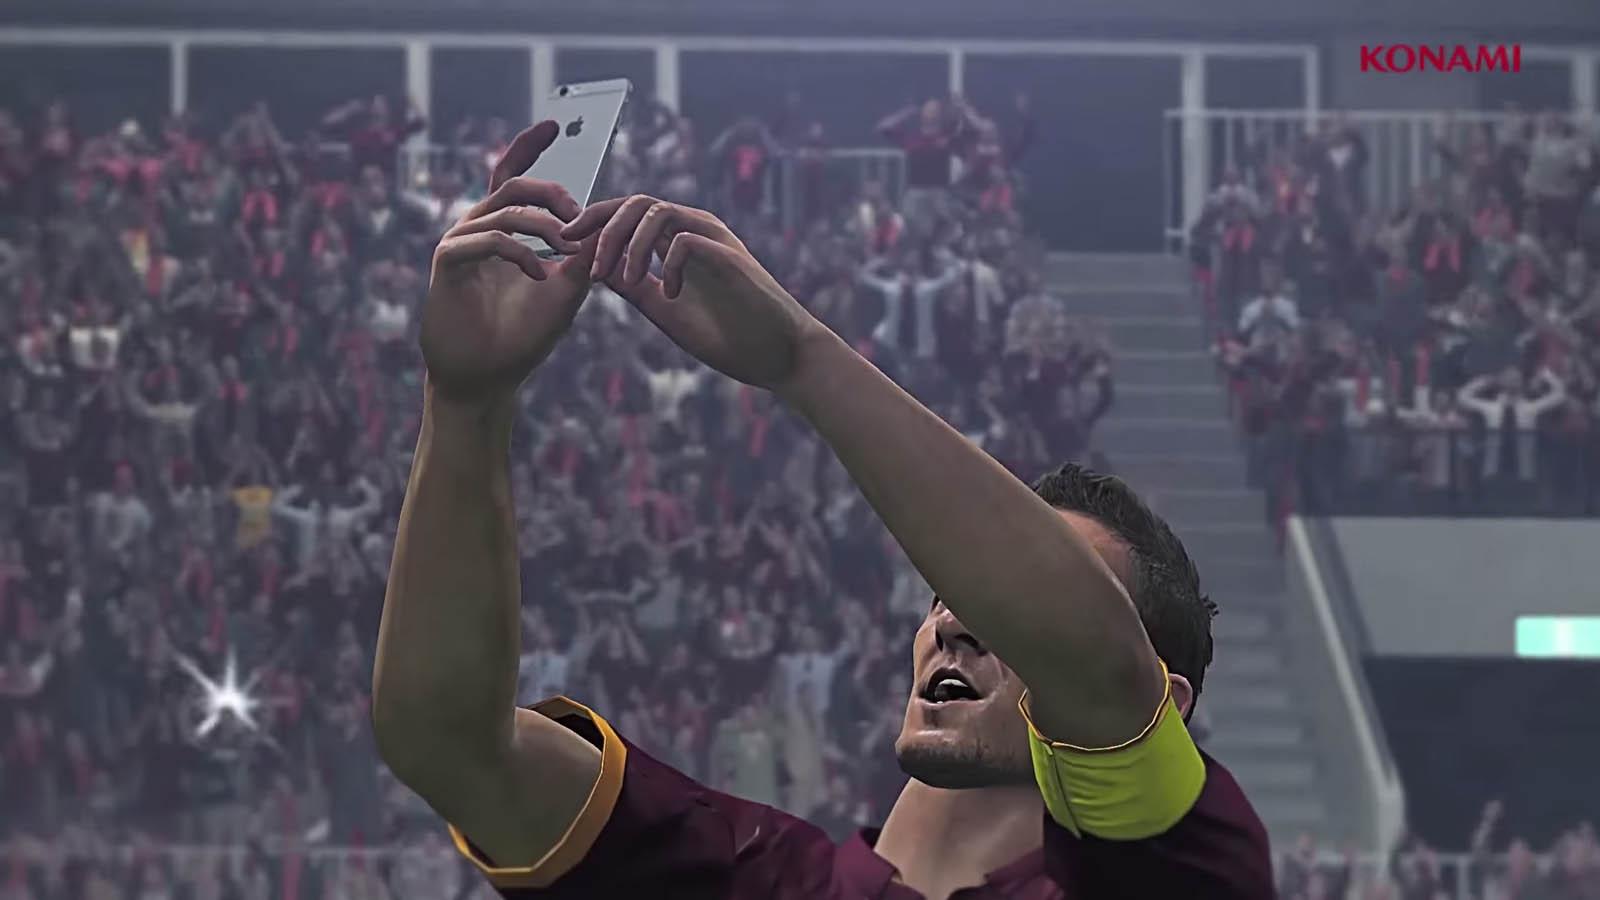 pes 16 totti selfie